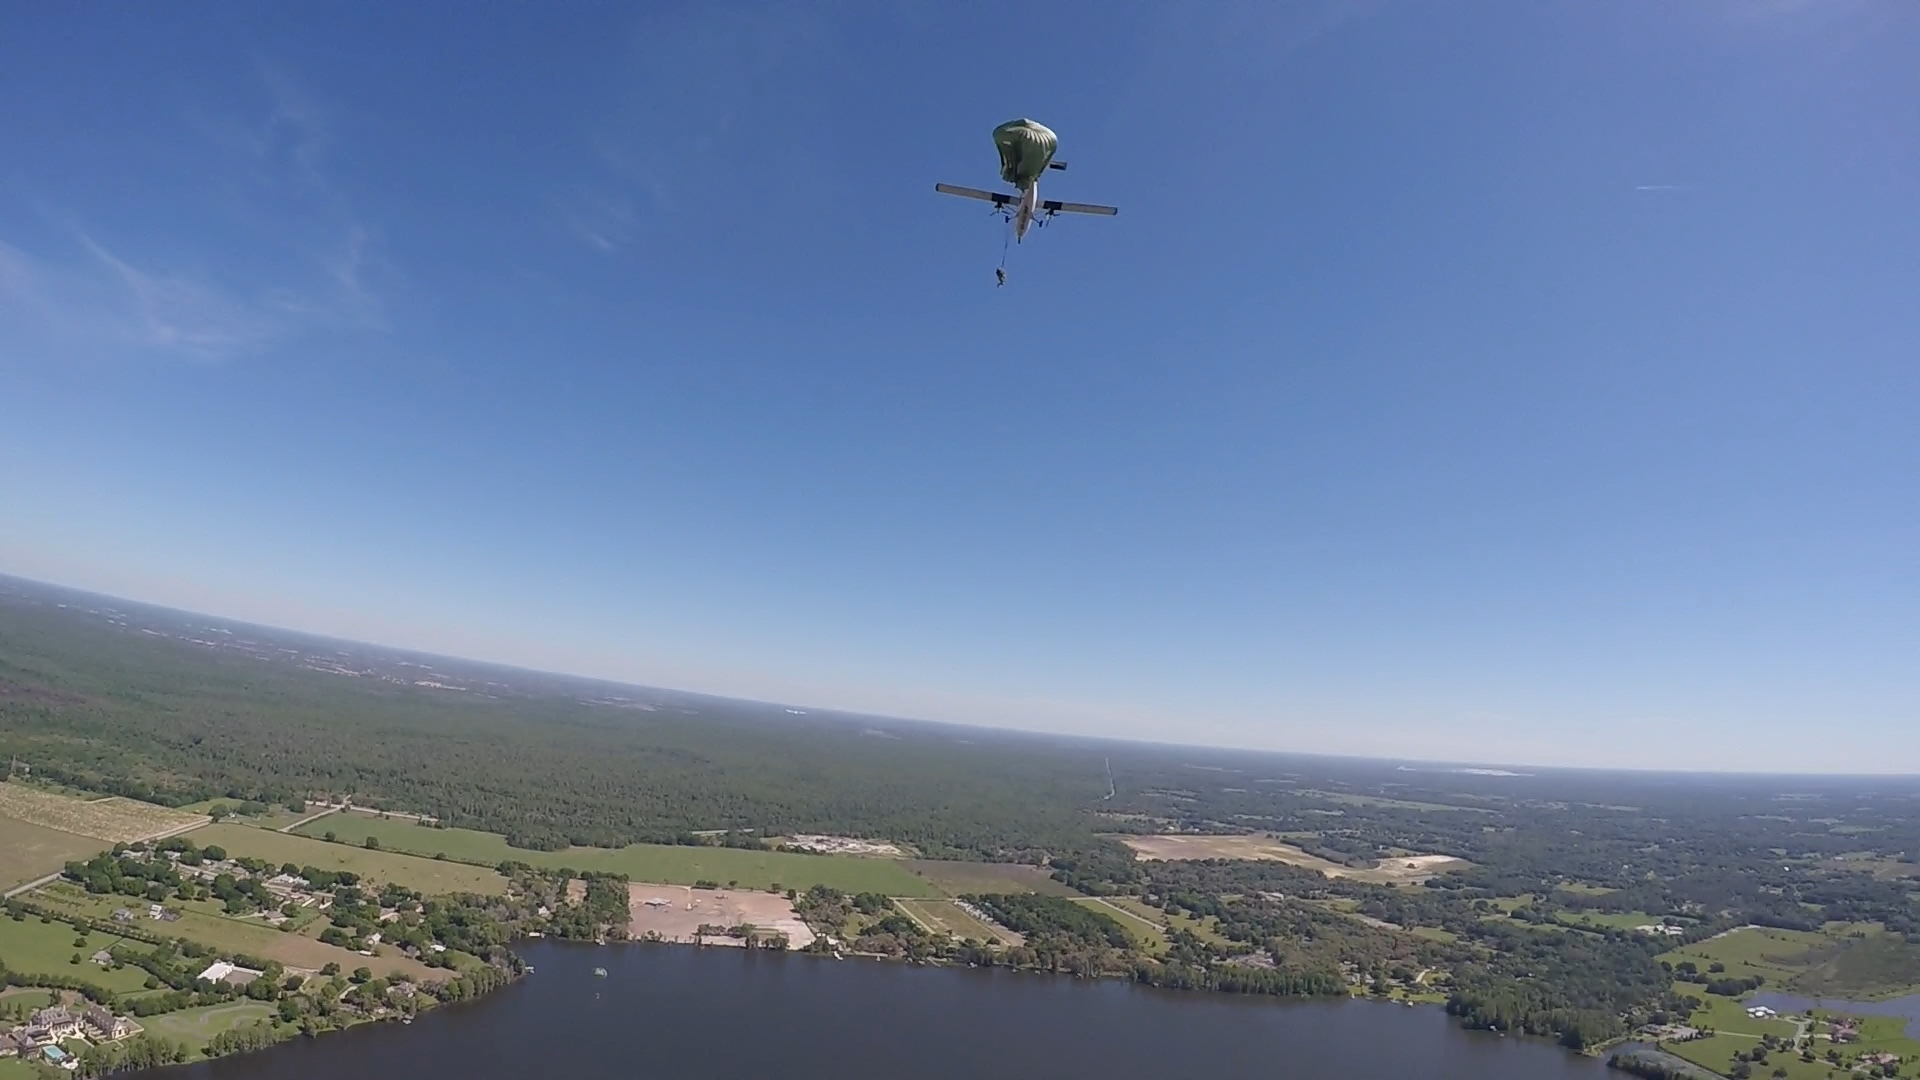 Airborne - 160409 - Andy exit.jpg